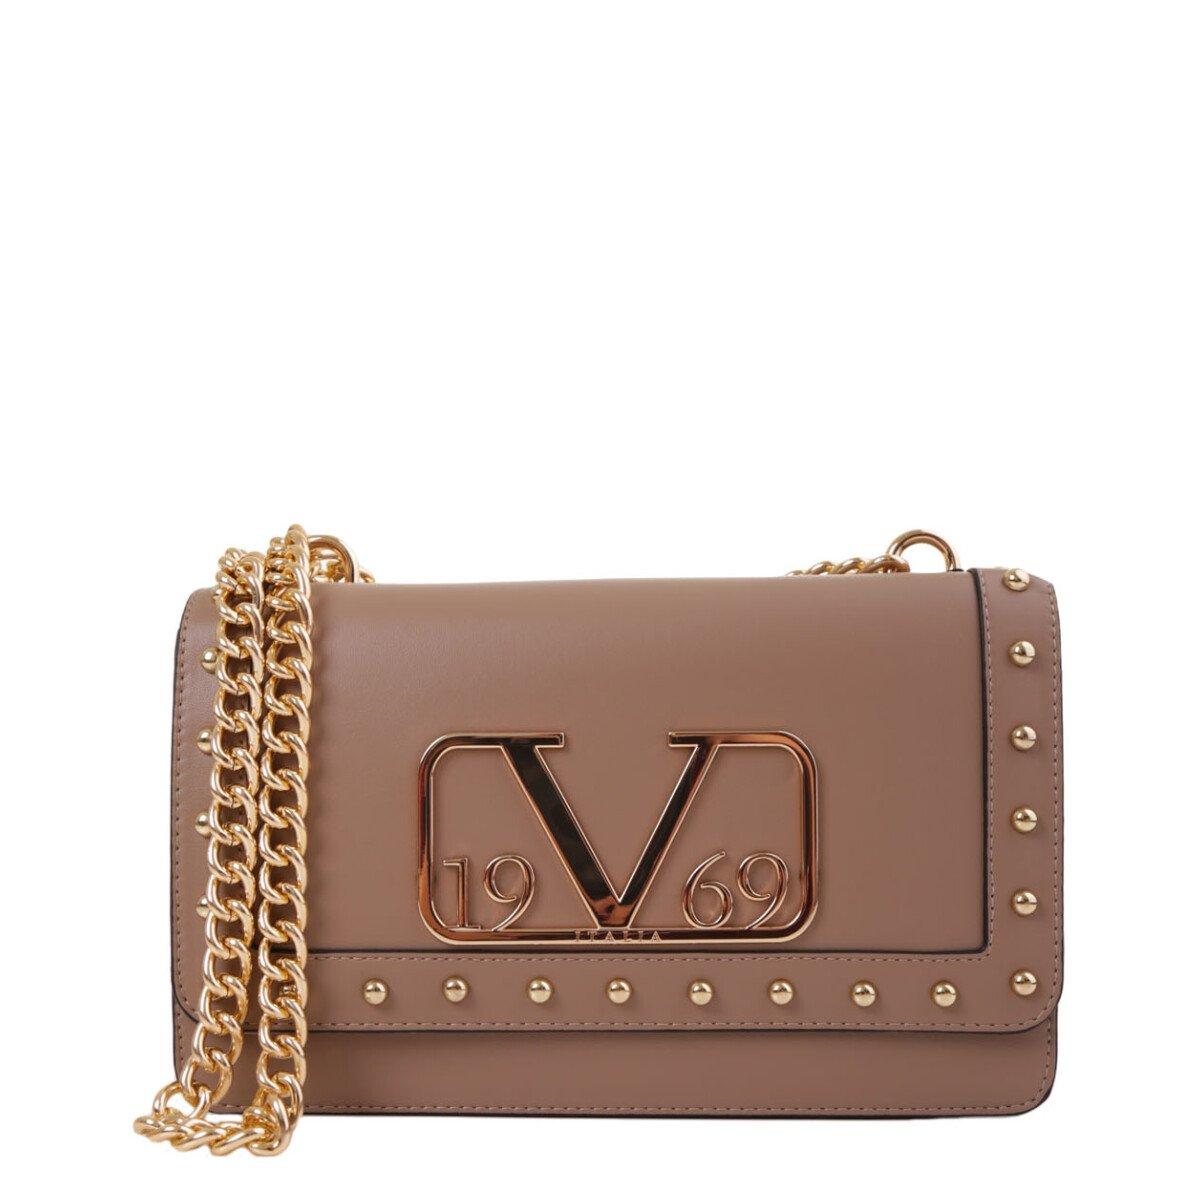 19v69 Italia Women's Shoulder Bag Various Colours 318683 - beige UNICA